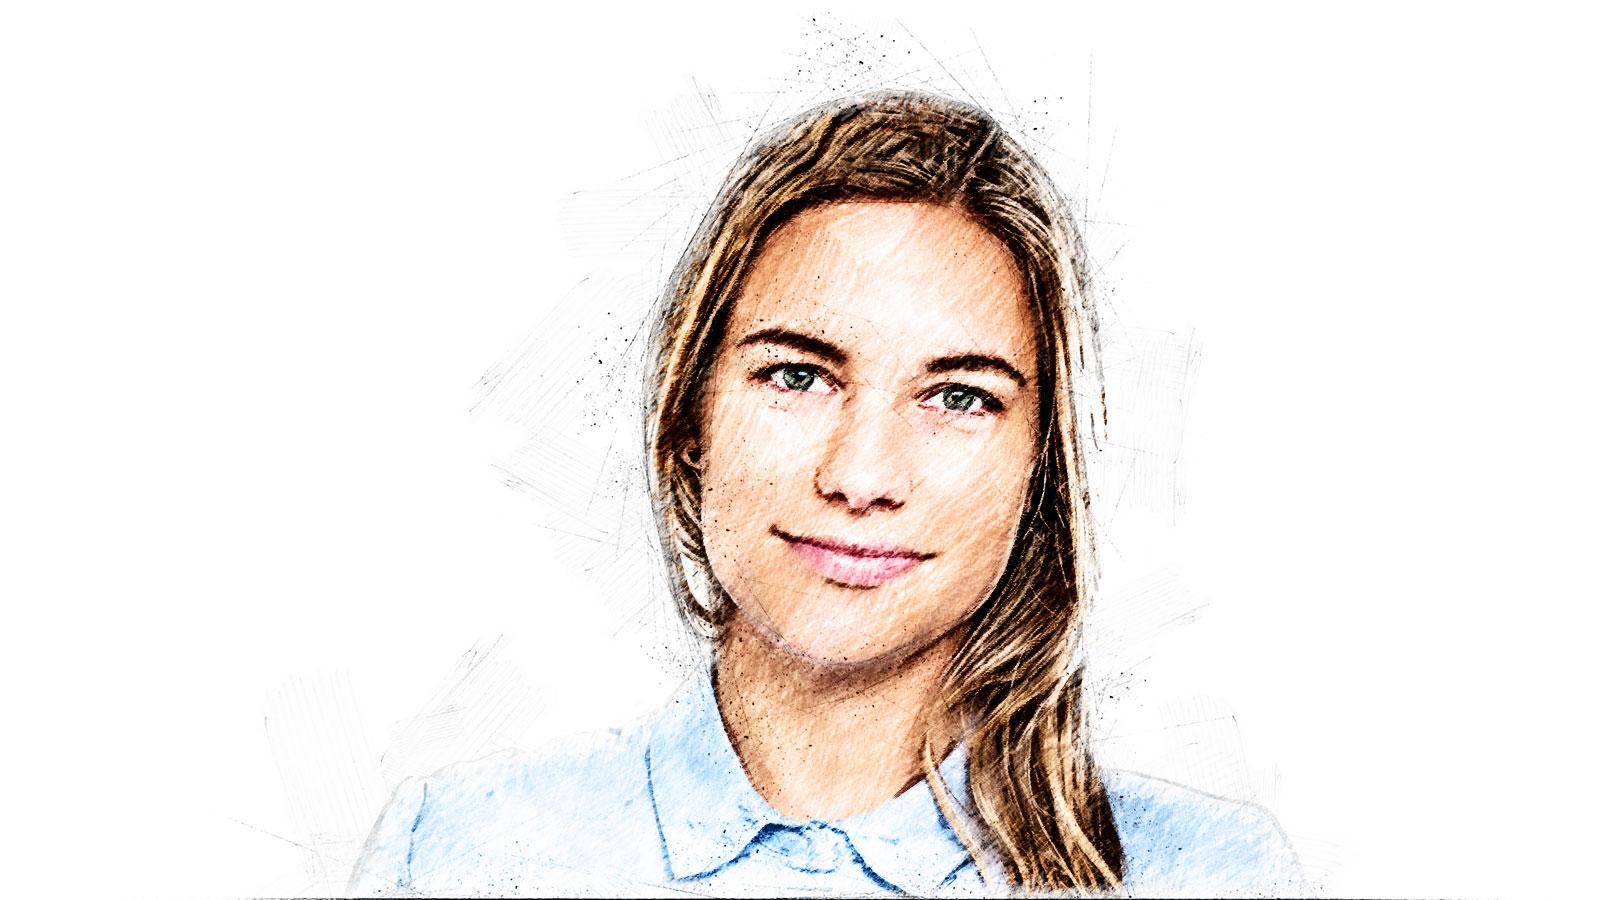 Katja Schmidt, DIW, Wissenschaftler, Flüchtlinge, Integration, Rassimsus